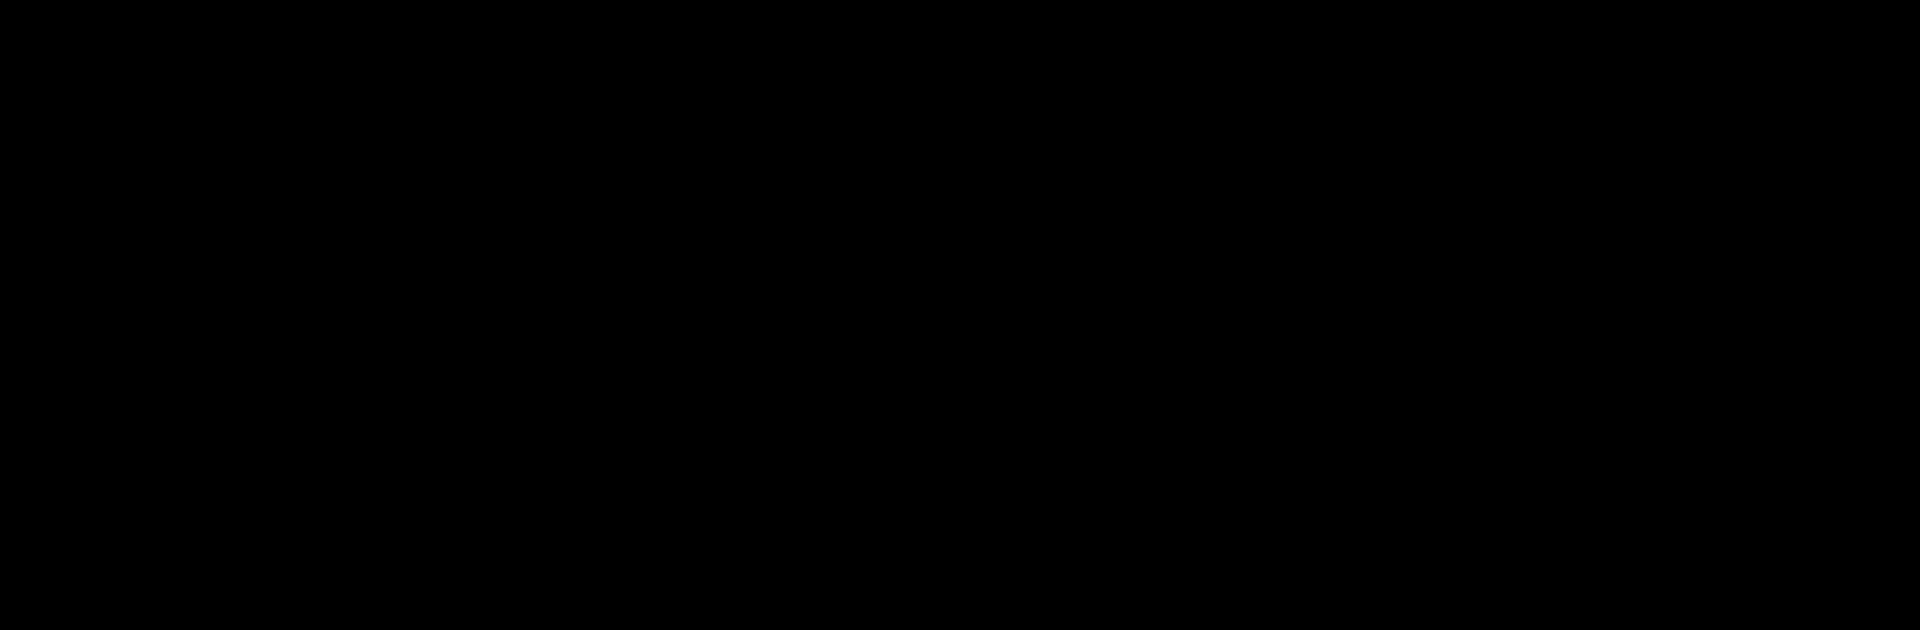 Black banner background